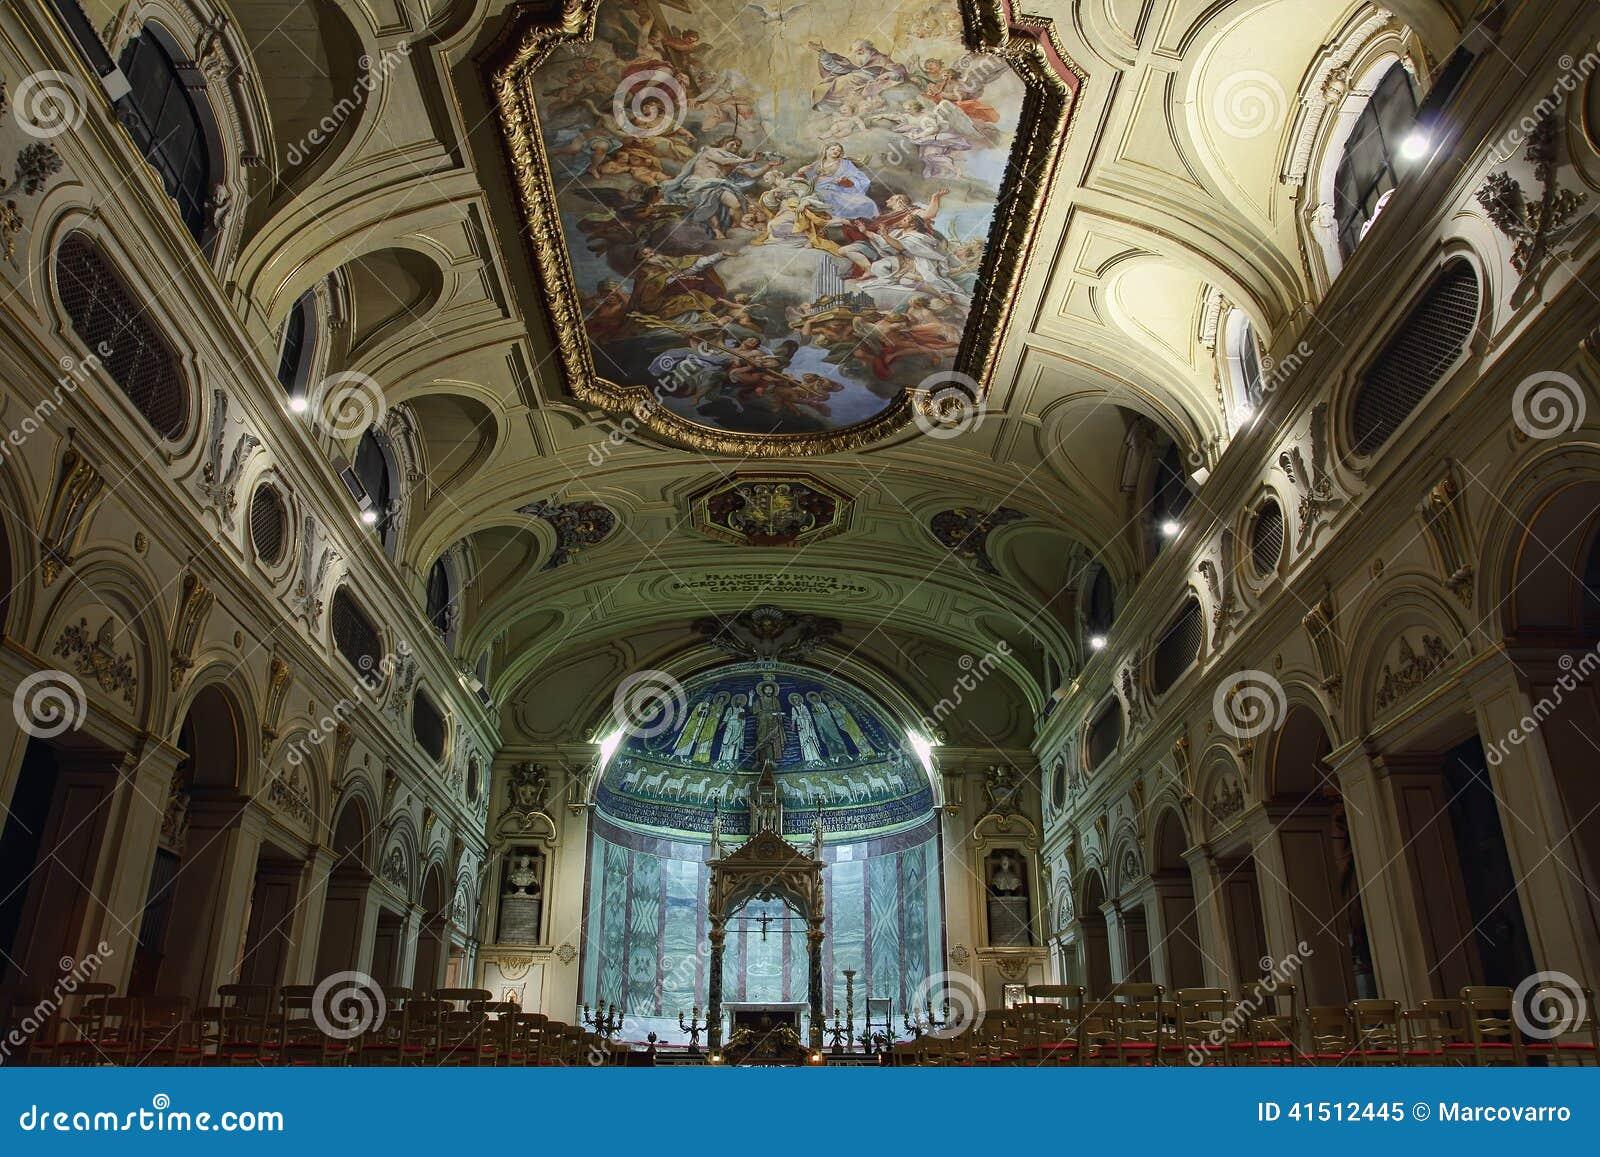 Baroque ceiling fresco in santa cecilia church rome italy baroque ceiling fresco in santa cecilia church rome italy royalty free stock photo dailygadgetfo Image collections